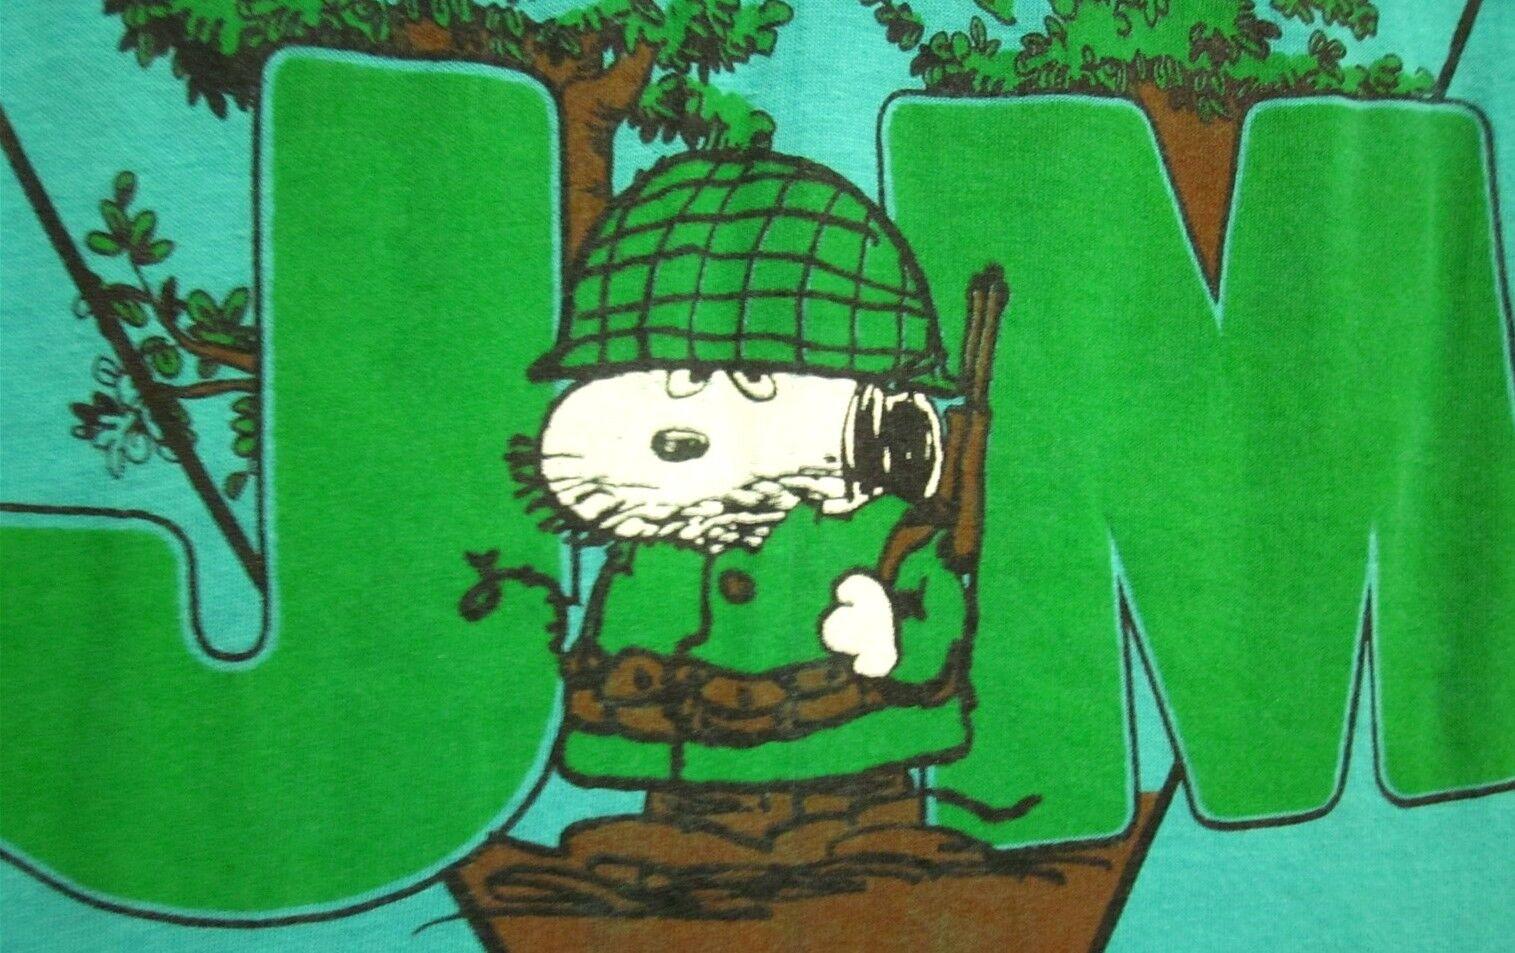 JOE MUD Grafenwohr Military Peanuts small T shirt 1970s Snoopy tee Germany Artex